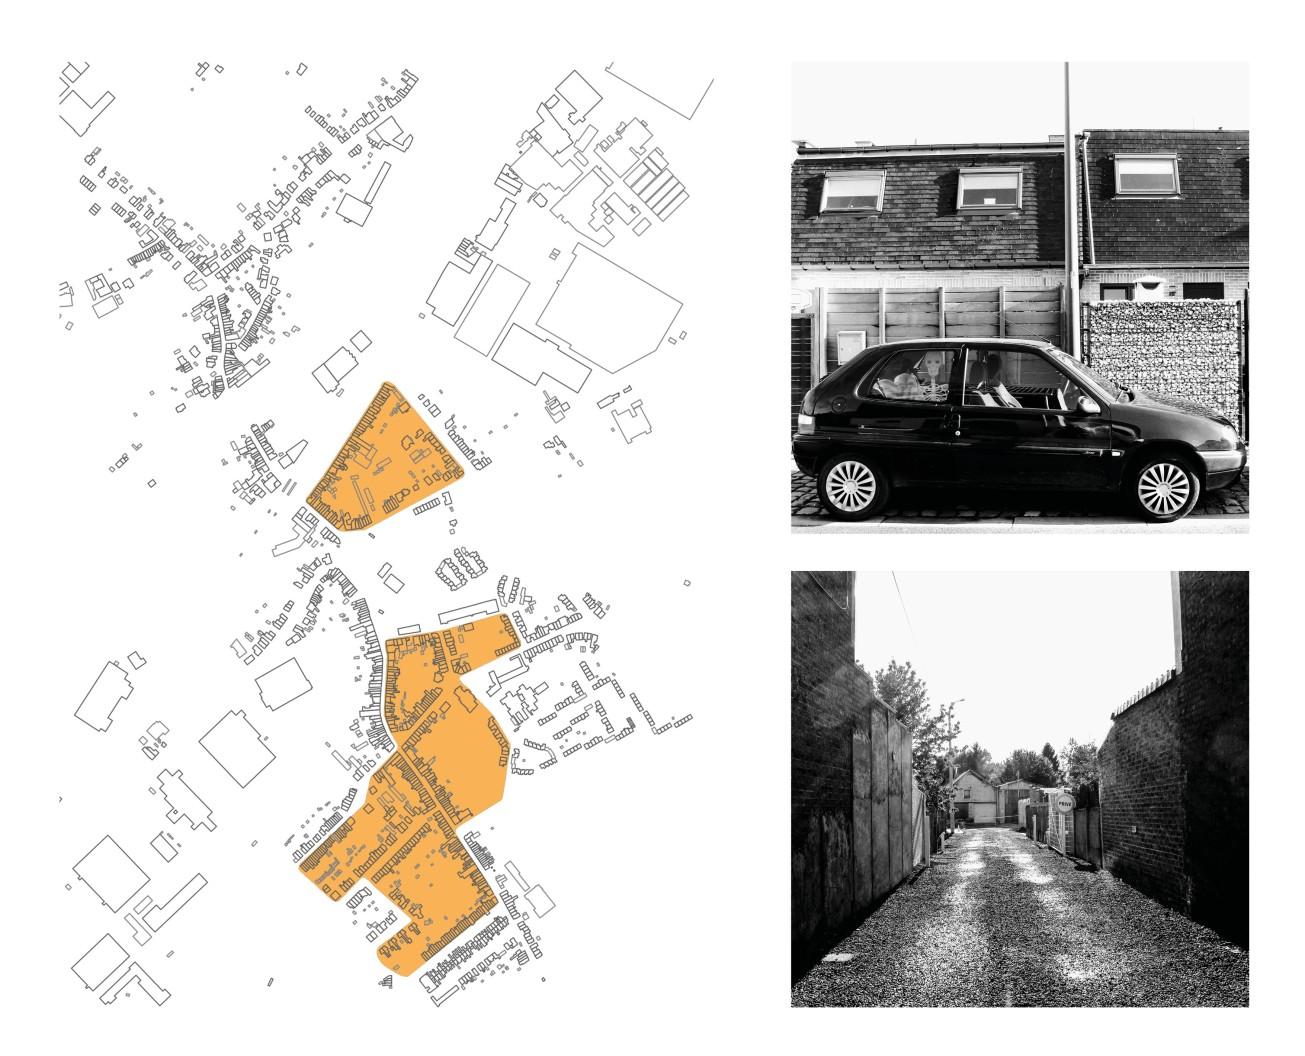 Atlas of Unexpected Spaces for Collectivity_Tomasz Bulczak_1st year_KU Leuven_20